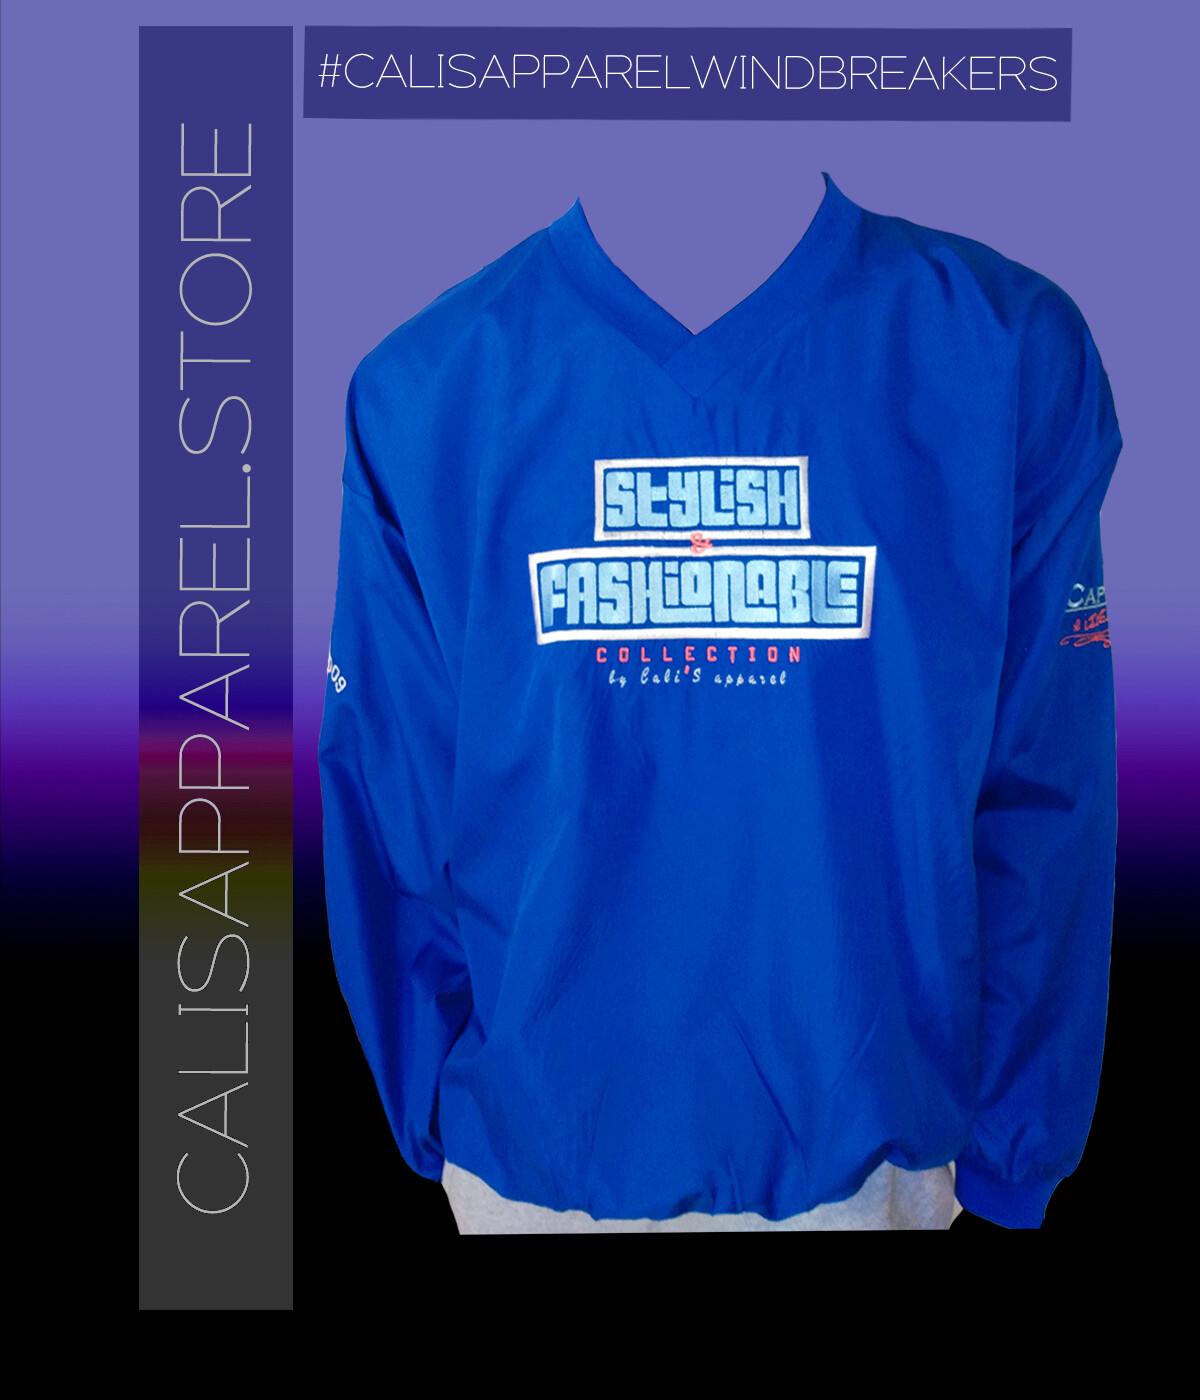 Cali's apparel Royal S&F Unisex V Neck Pullover Windbreaker Jacket